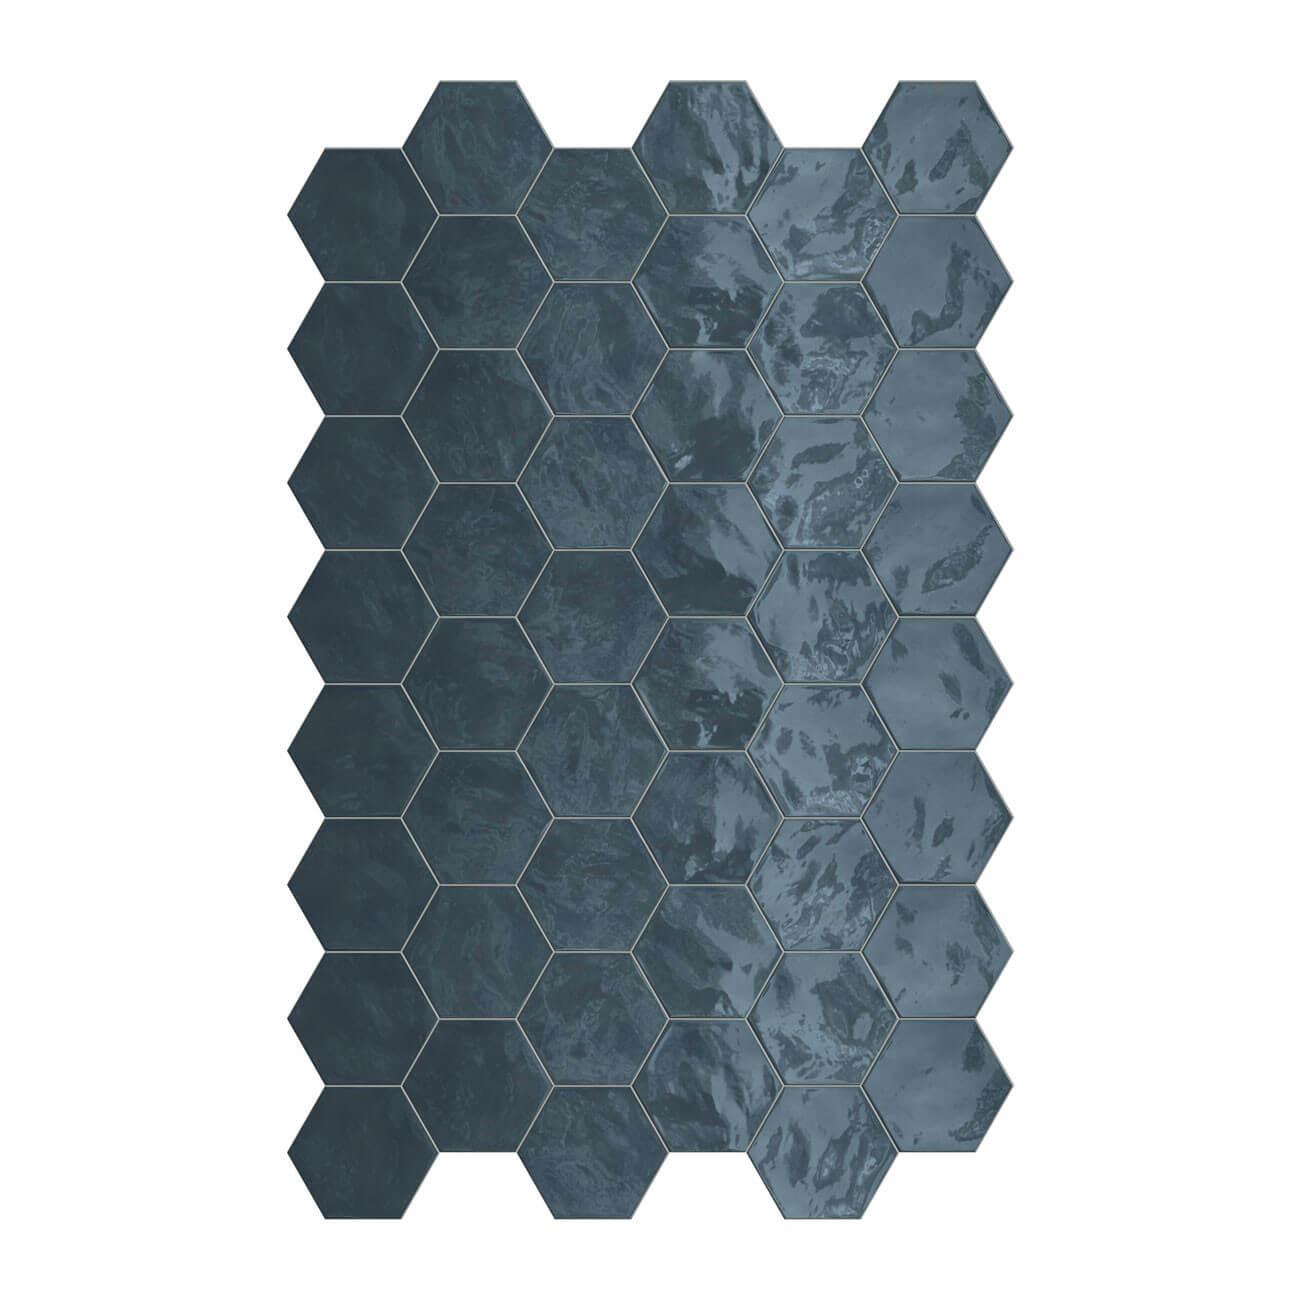 Carrelage hexagonal mur Hexa Wall Ocean